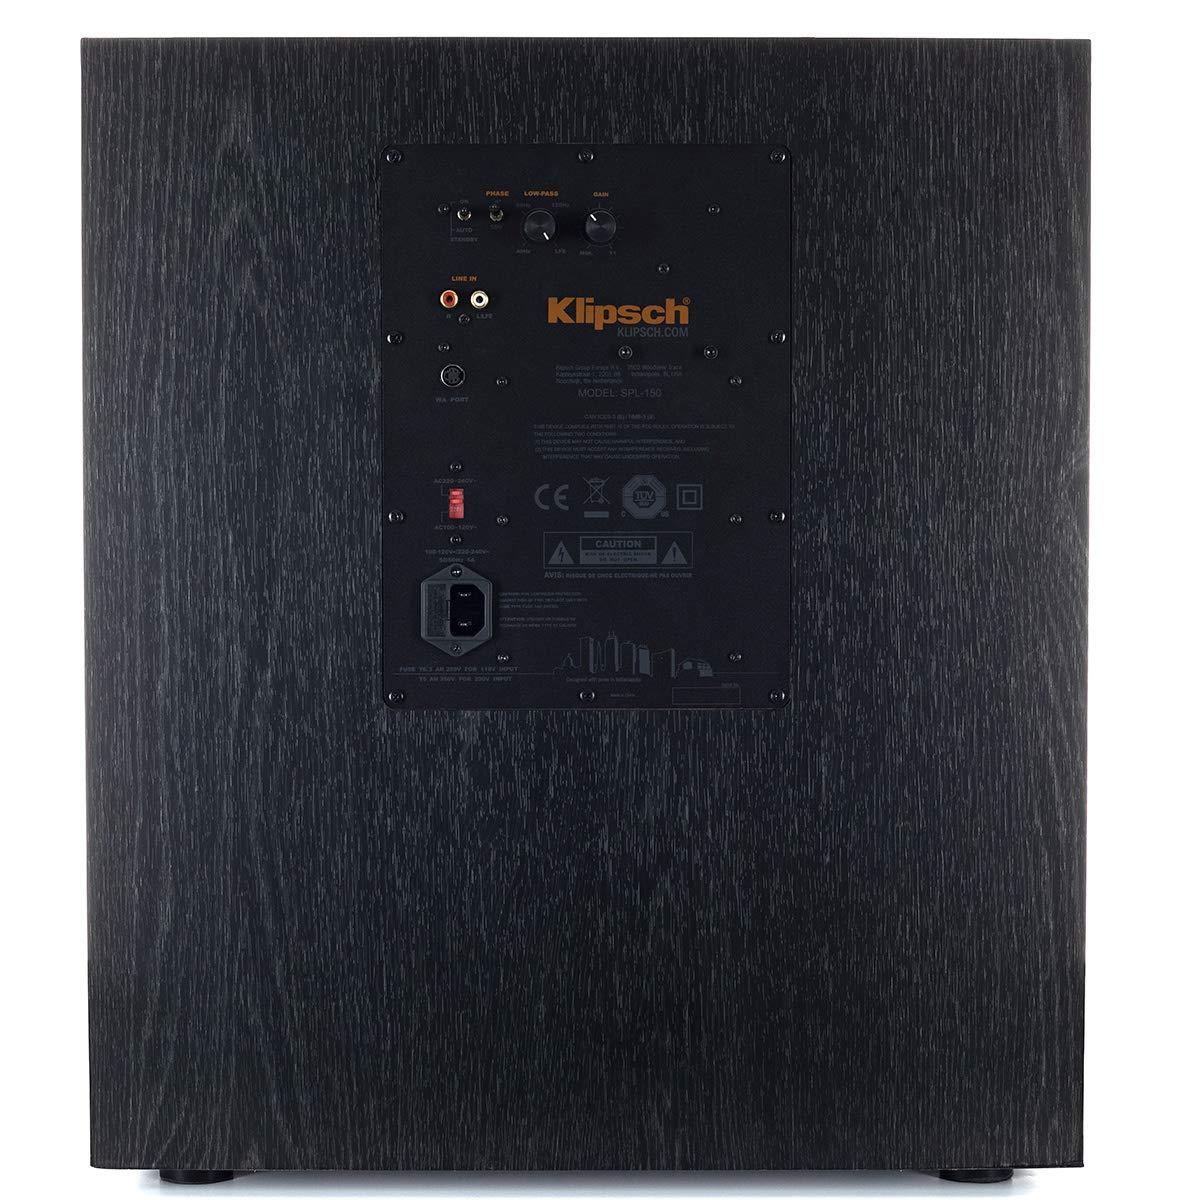 Ebony Klipsch RP-8000F 7.1 Home Theater System